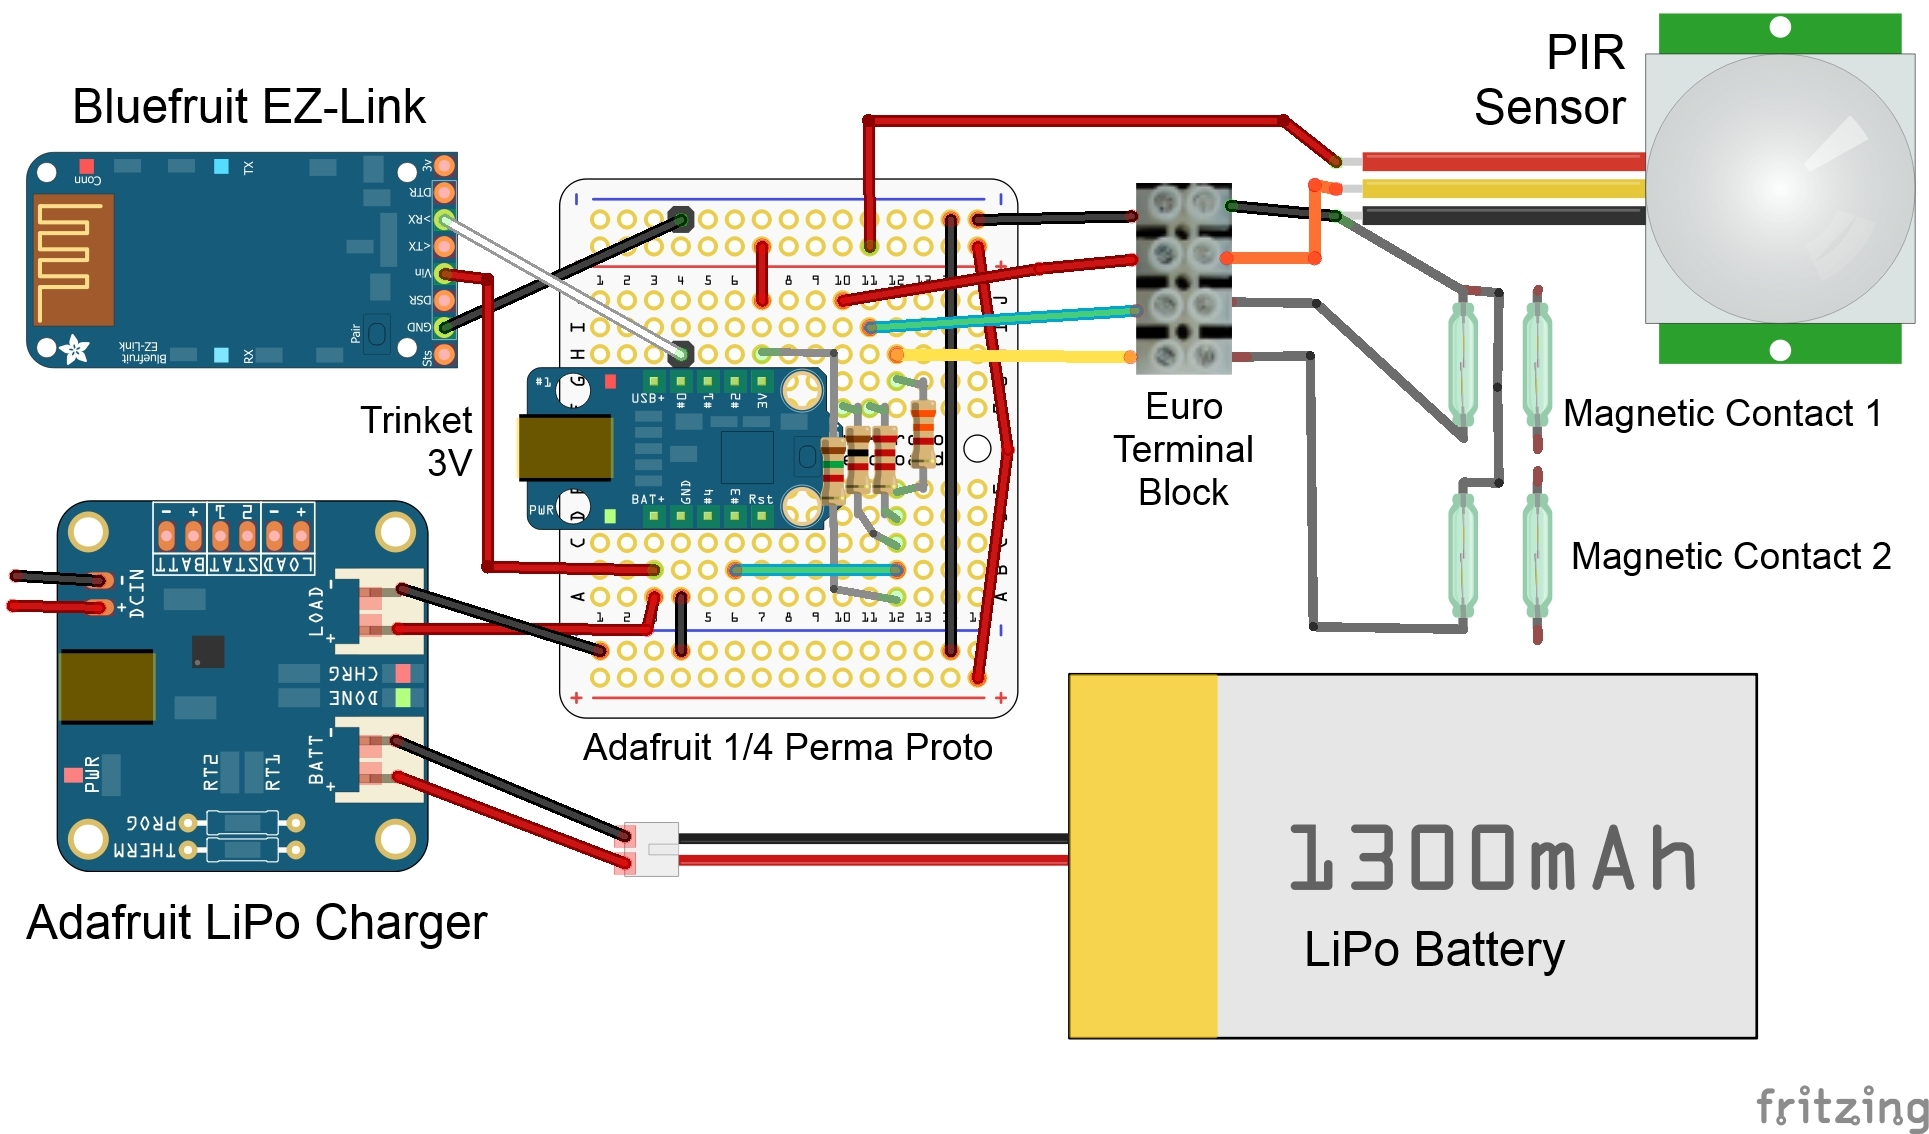 trinket_Alarm-Bluefruit-Annotated.jpg